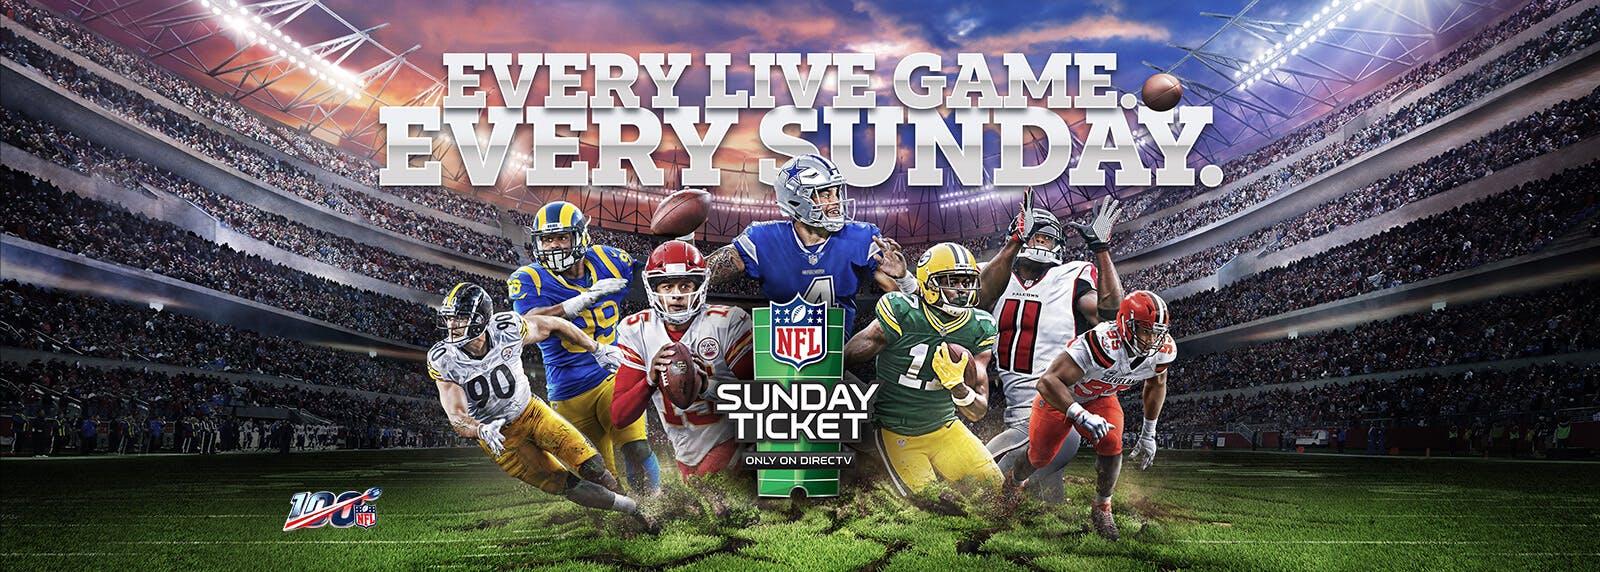 watch saints vs bears live stream nfl sunday ticket